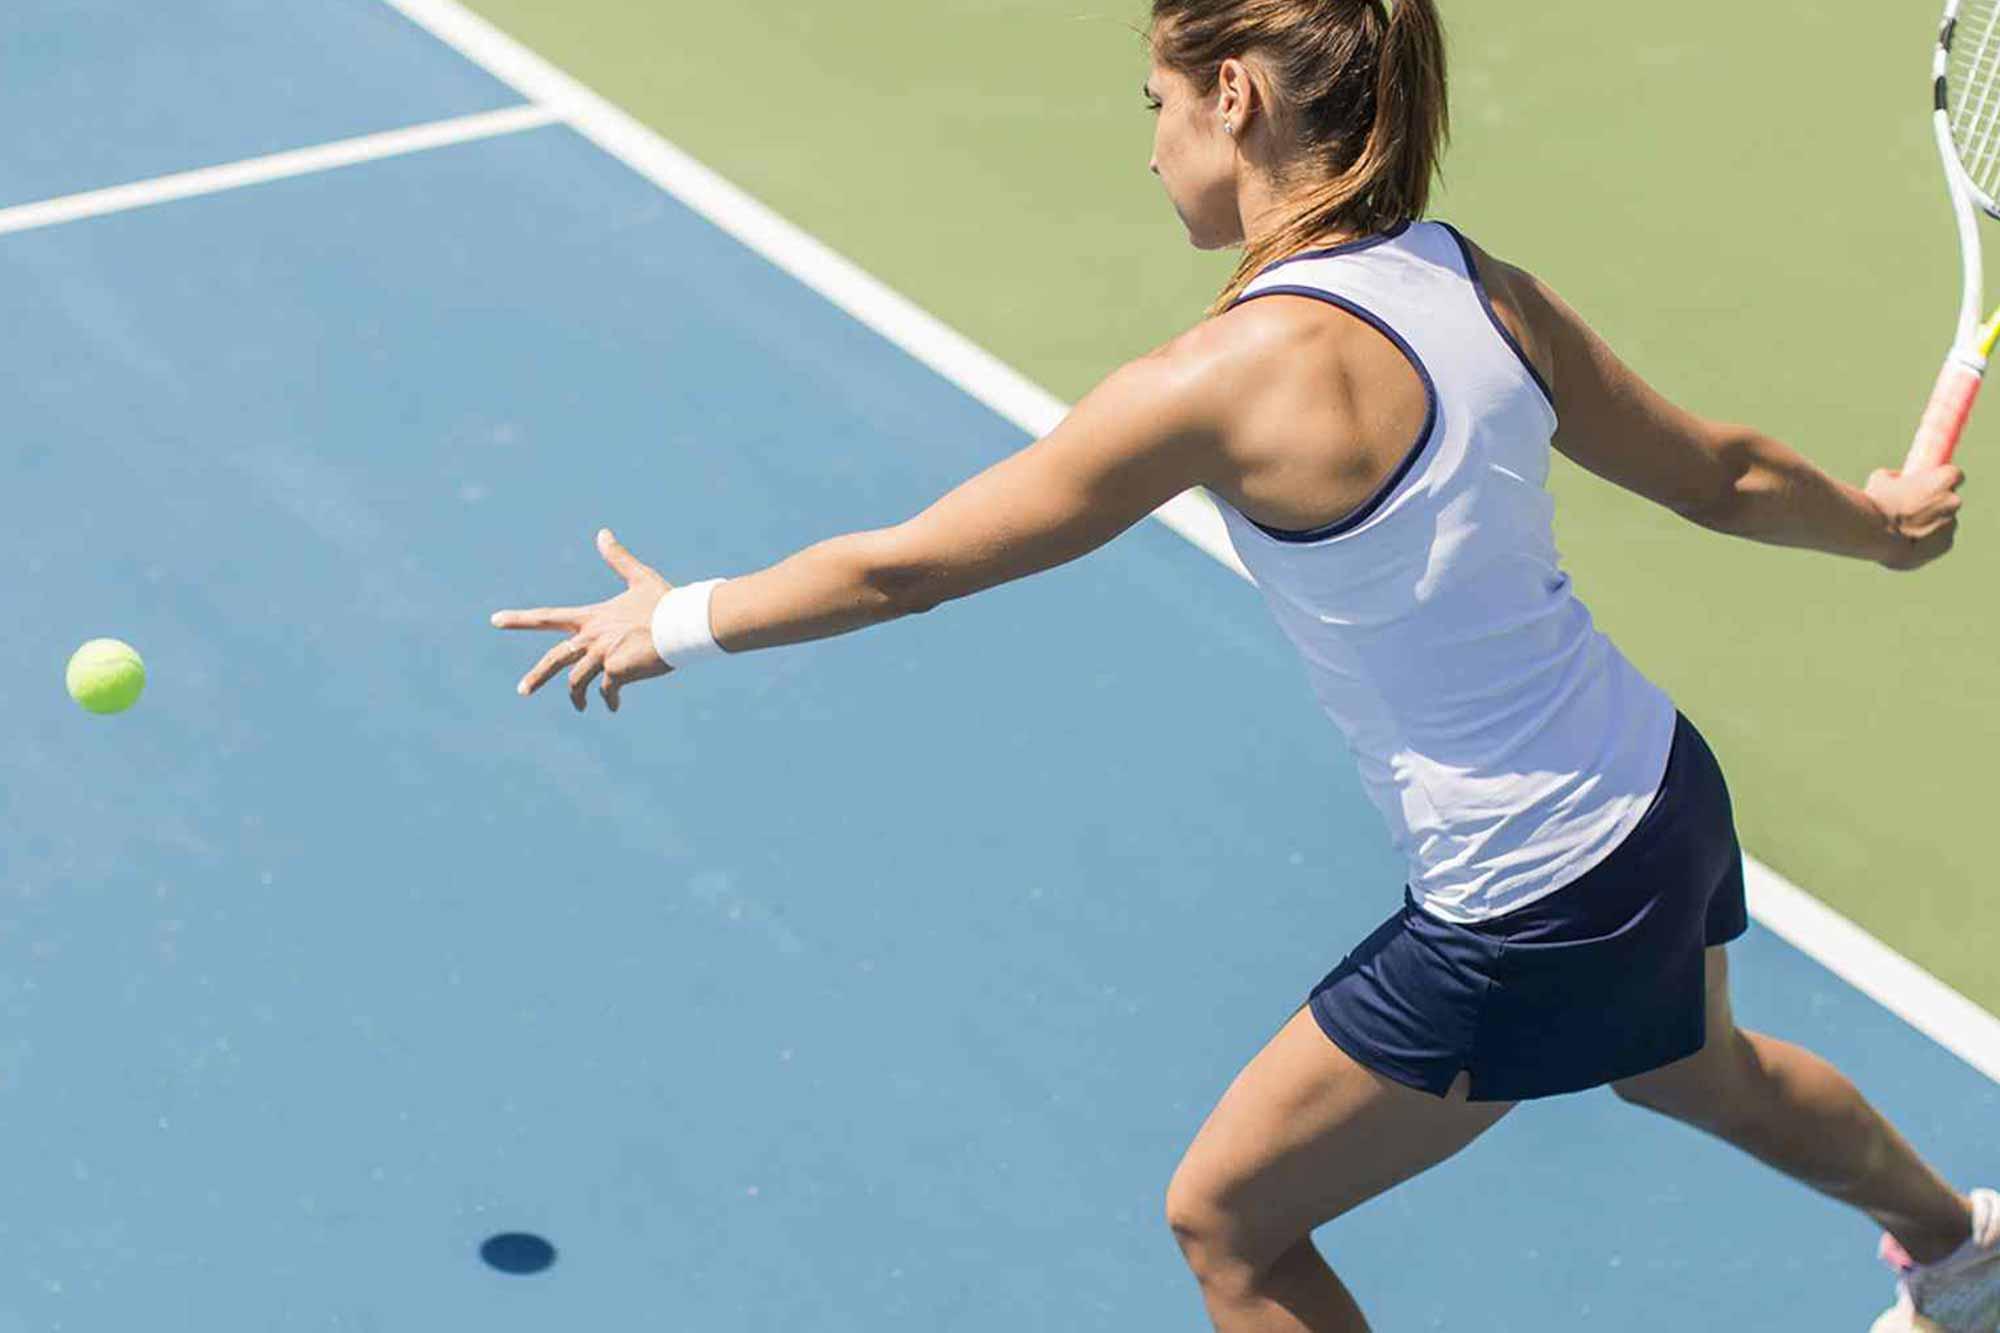 https://sport-sante-nantes.com/wp-content/uploads/2018/08/pratique-sports-nantes.jpg